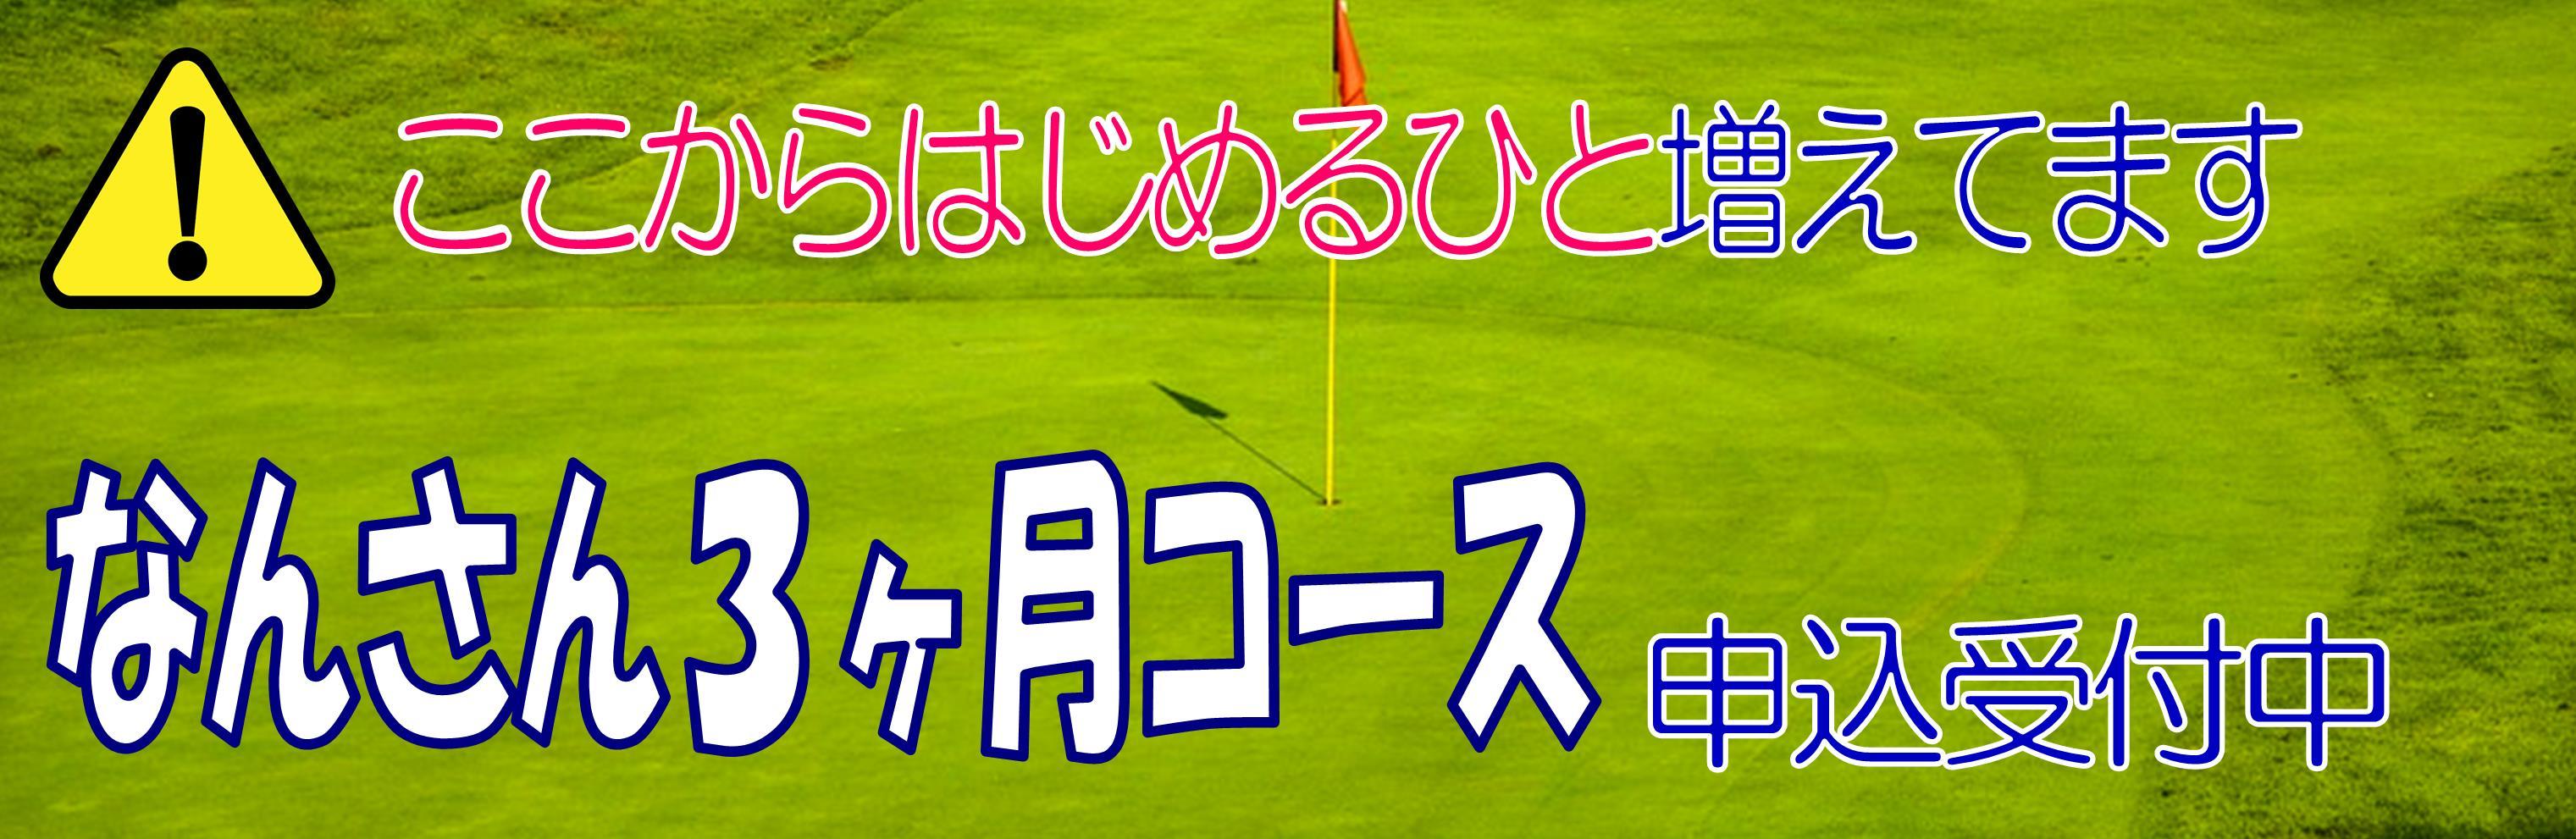 http://www.bsga.jp/kumamoto/golf-news/2018/04/2081/